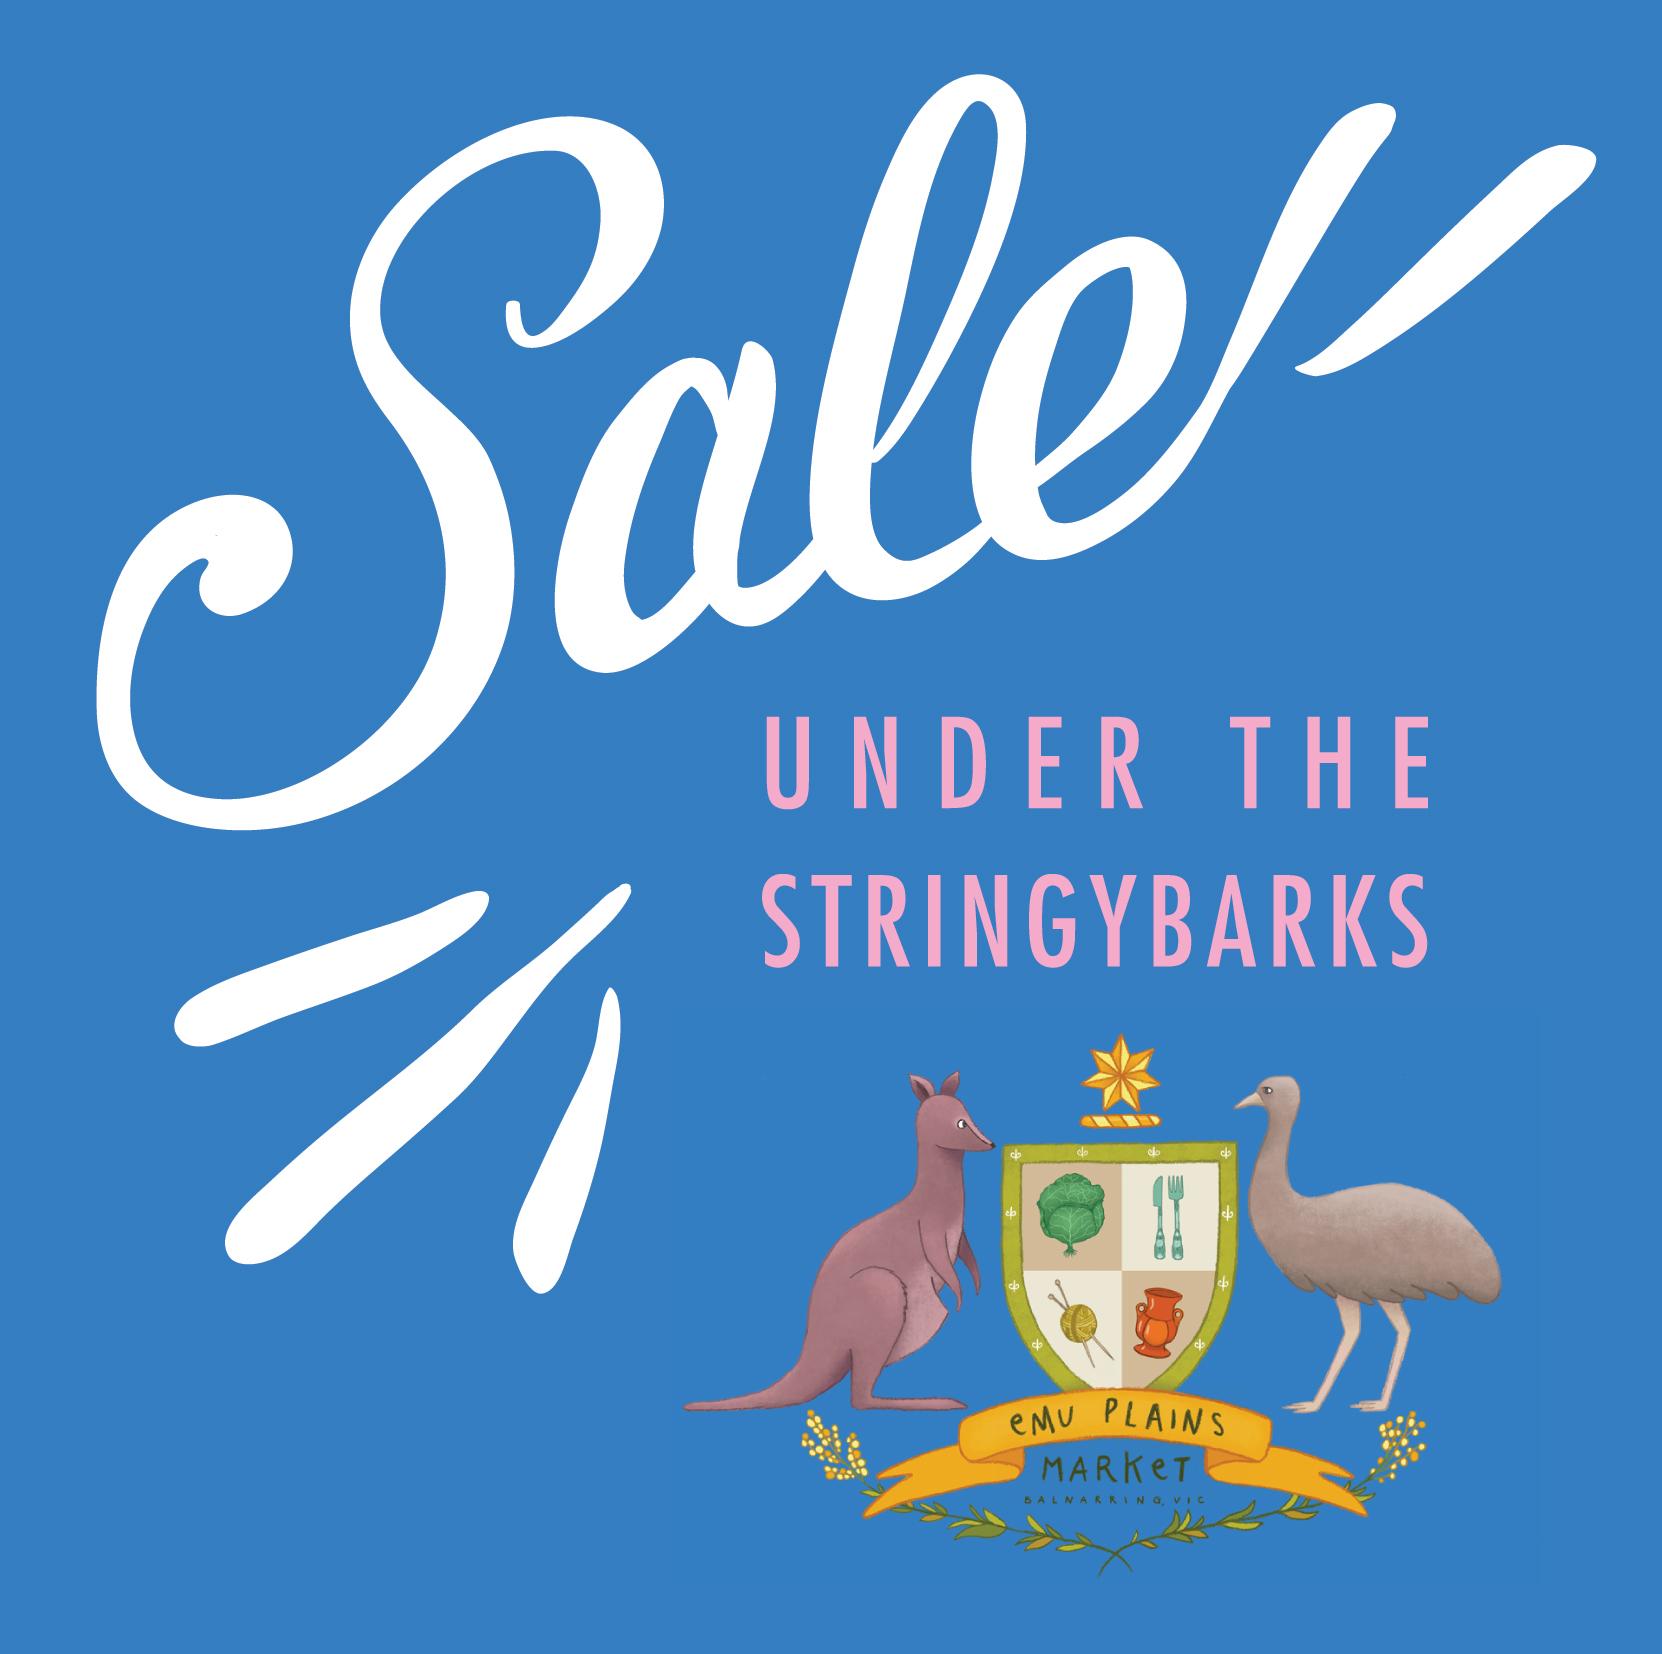 Sale #underthestringybarks